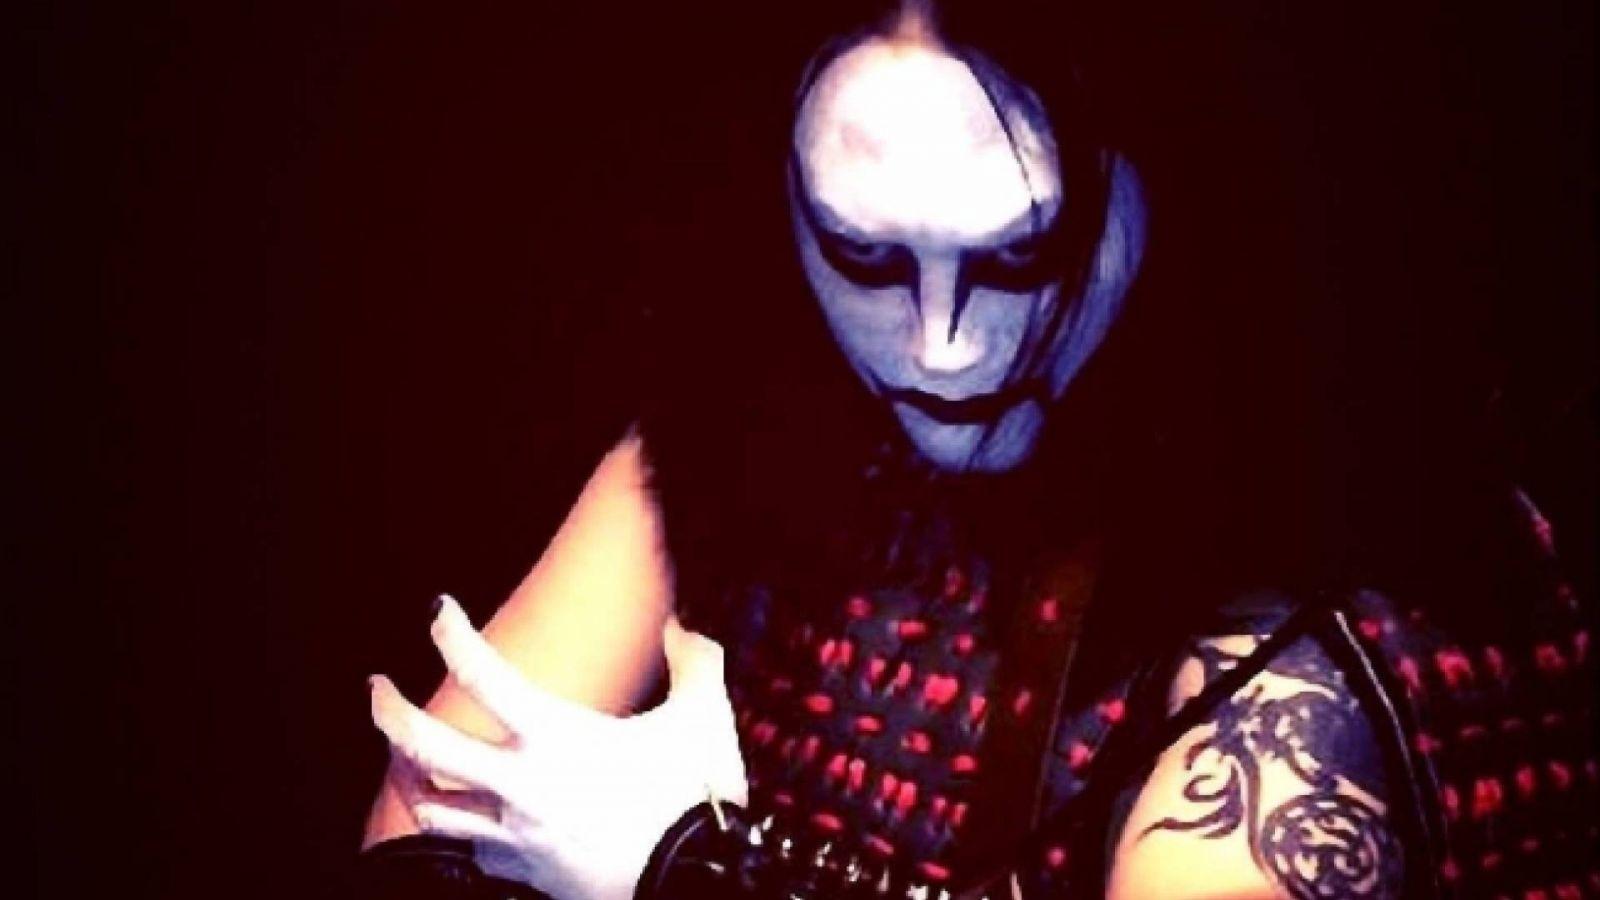 Black metal -projekti Taekaury julkaisi uuden singlen © Taekaury. All Rights Reserved.